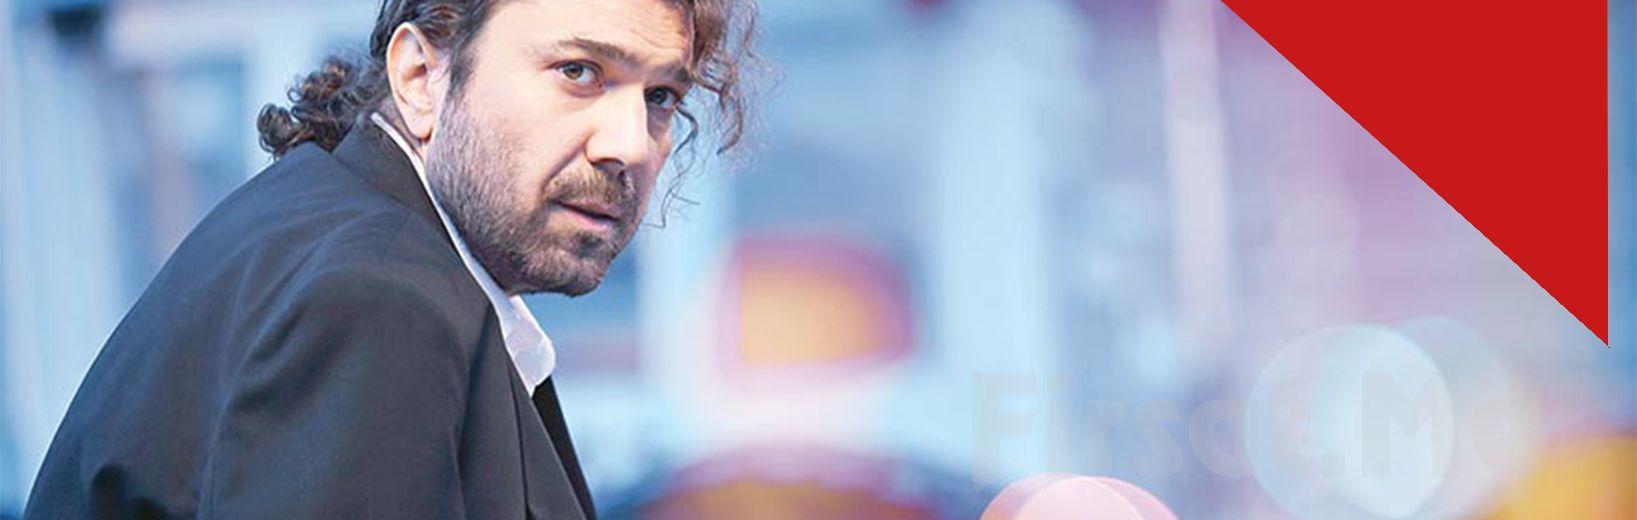 Beyrut Performance Kartal Sahne'de 13 Ekim'de Halil Sezai Konser Bileti